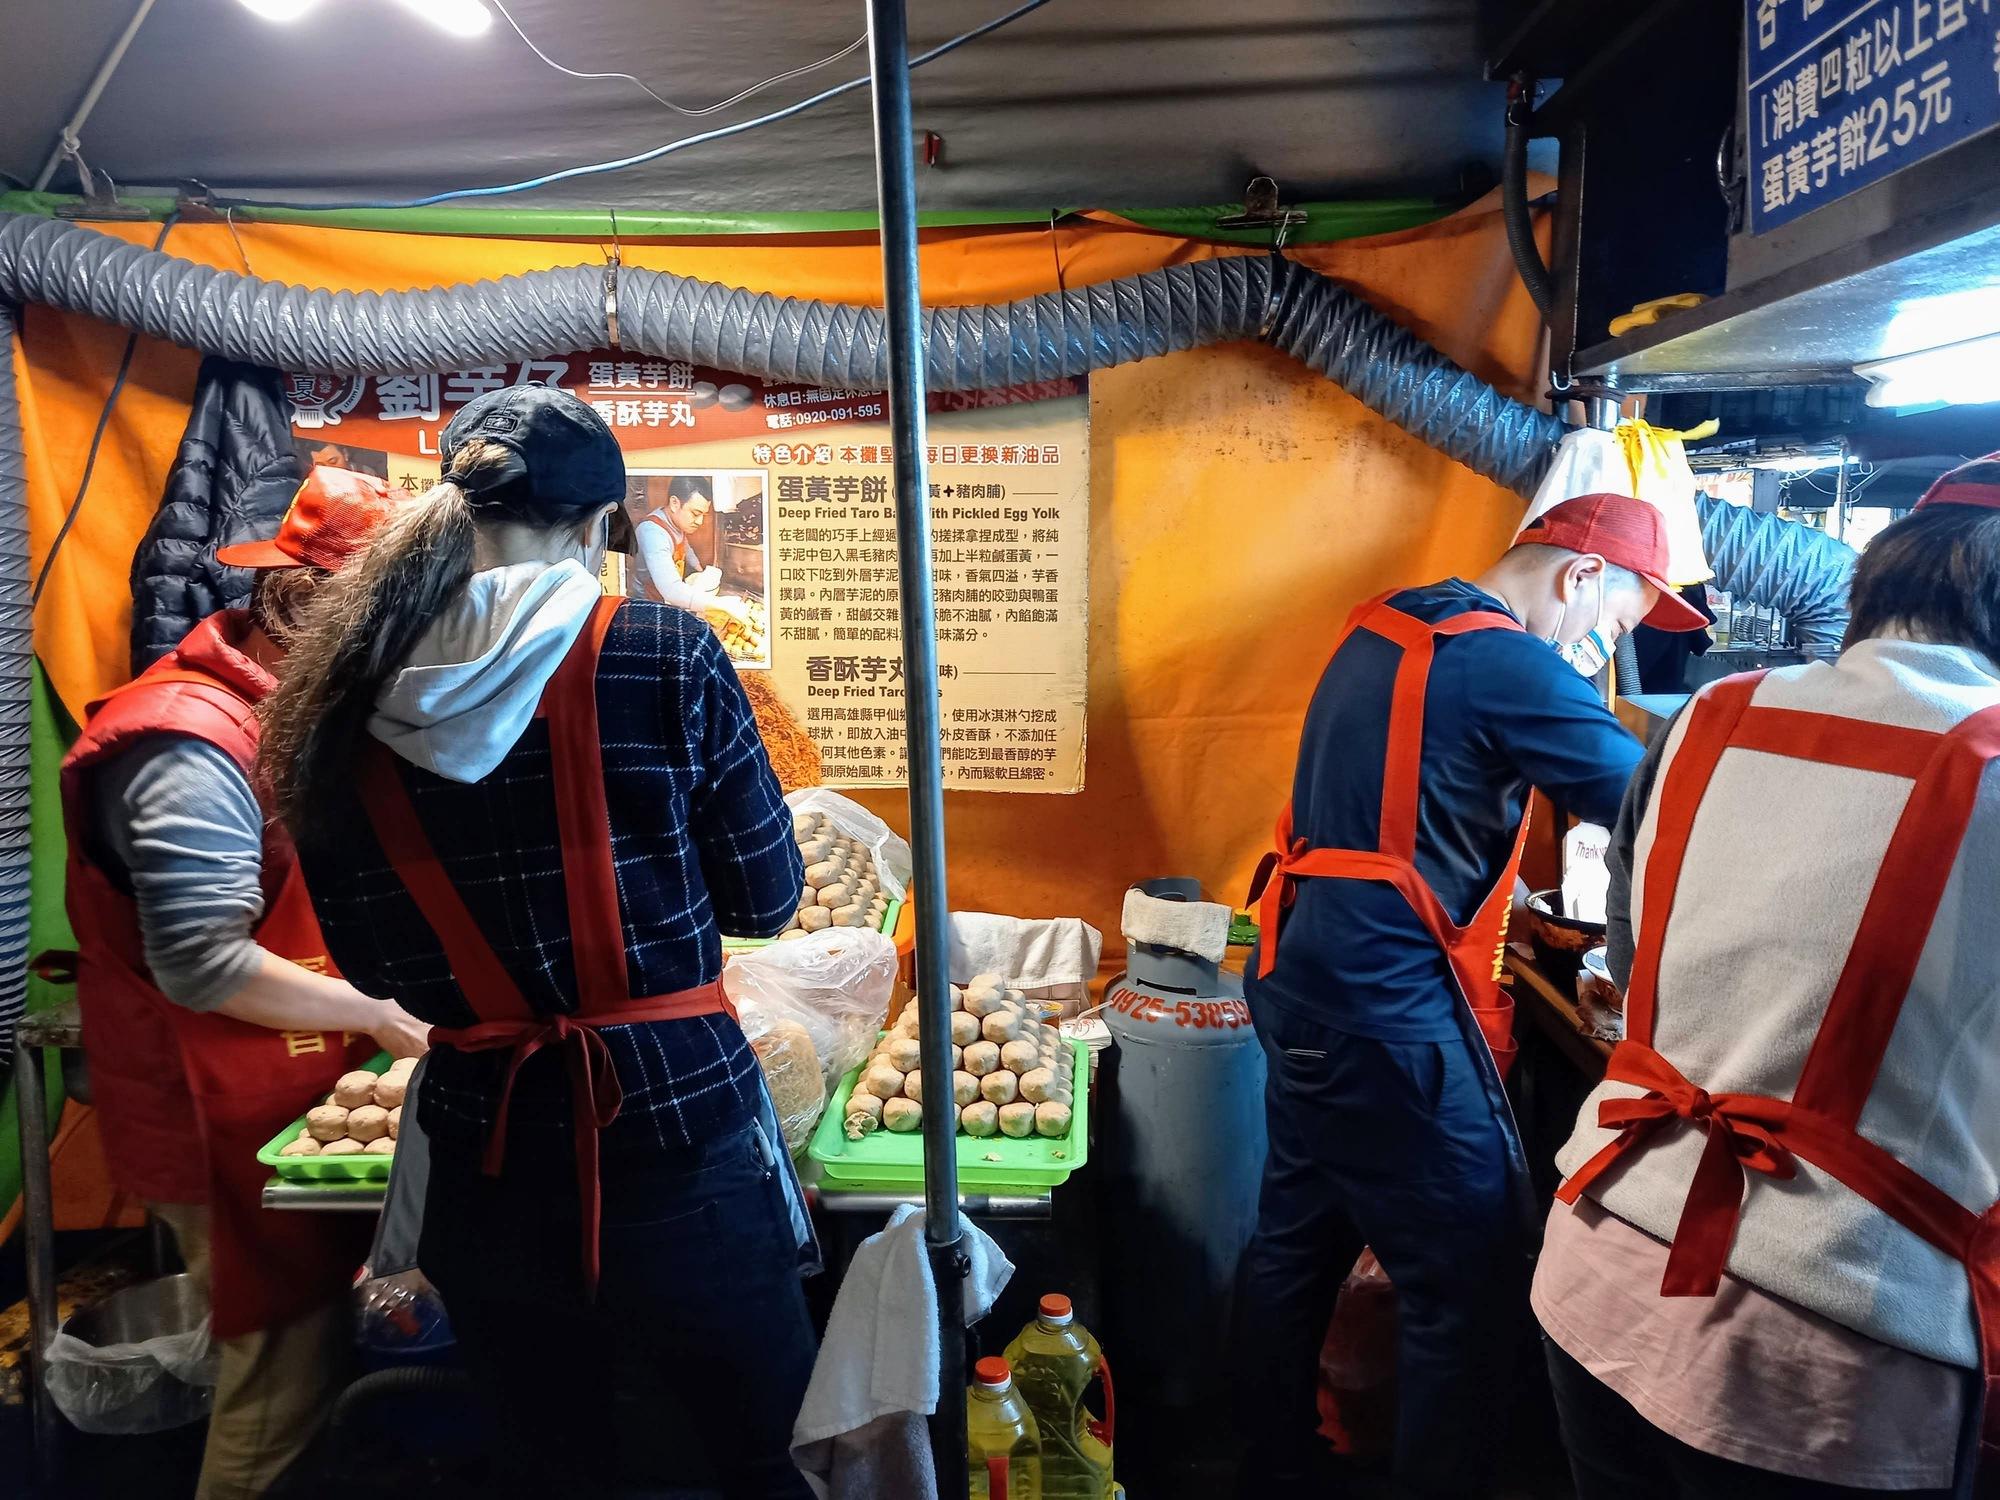 Famous fried taro balls 炸芋丸 at Liu Yu Zi 劉芋仔, Ningxia Night Market